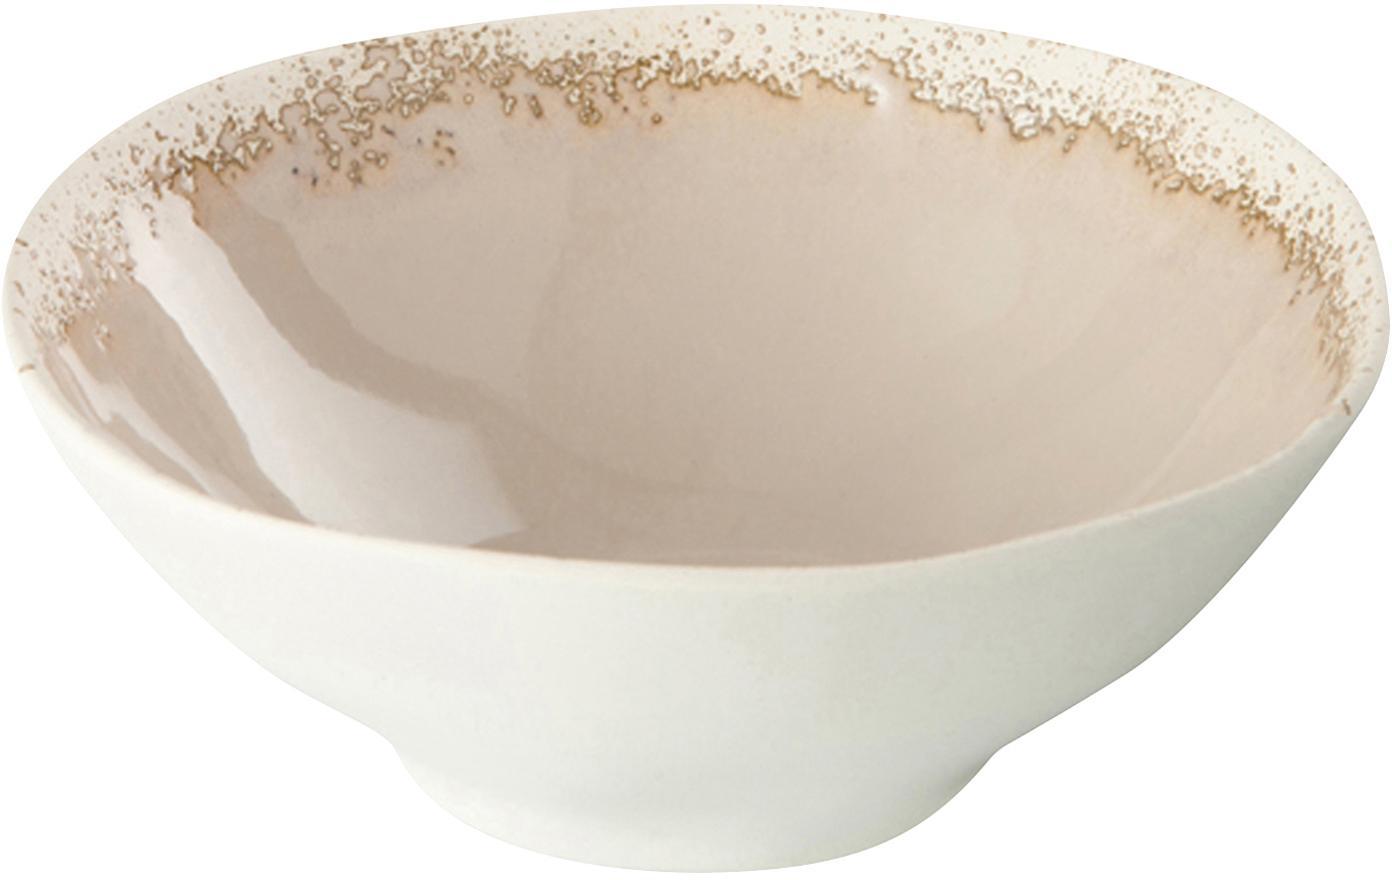 Miska Reyes, 4 szt., Ceramika, Kremowy, Ø 15 x 6 cm